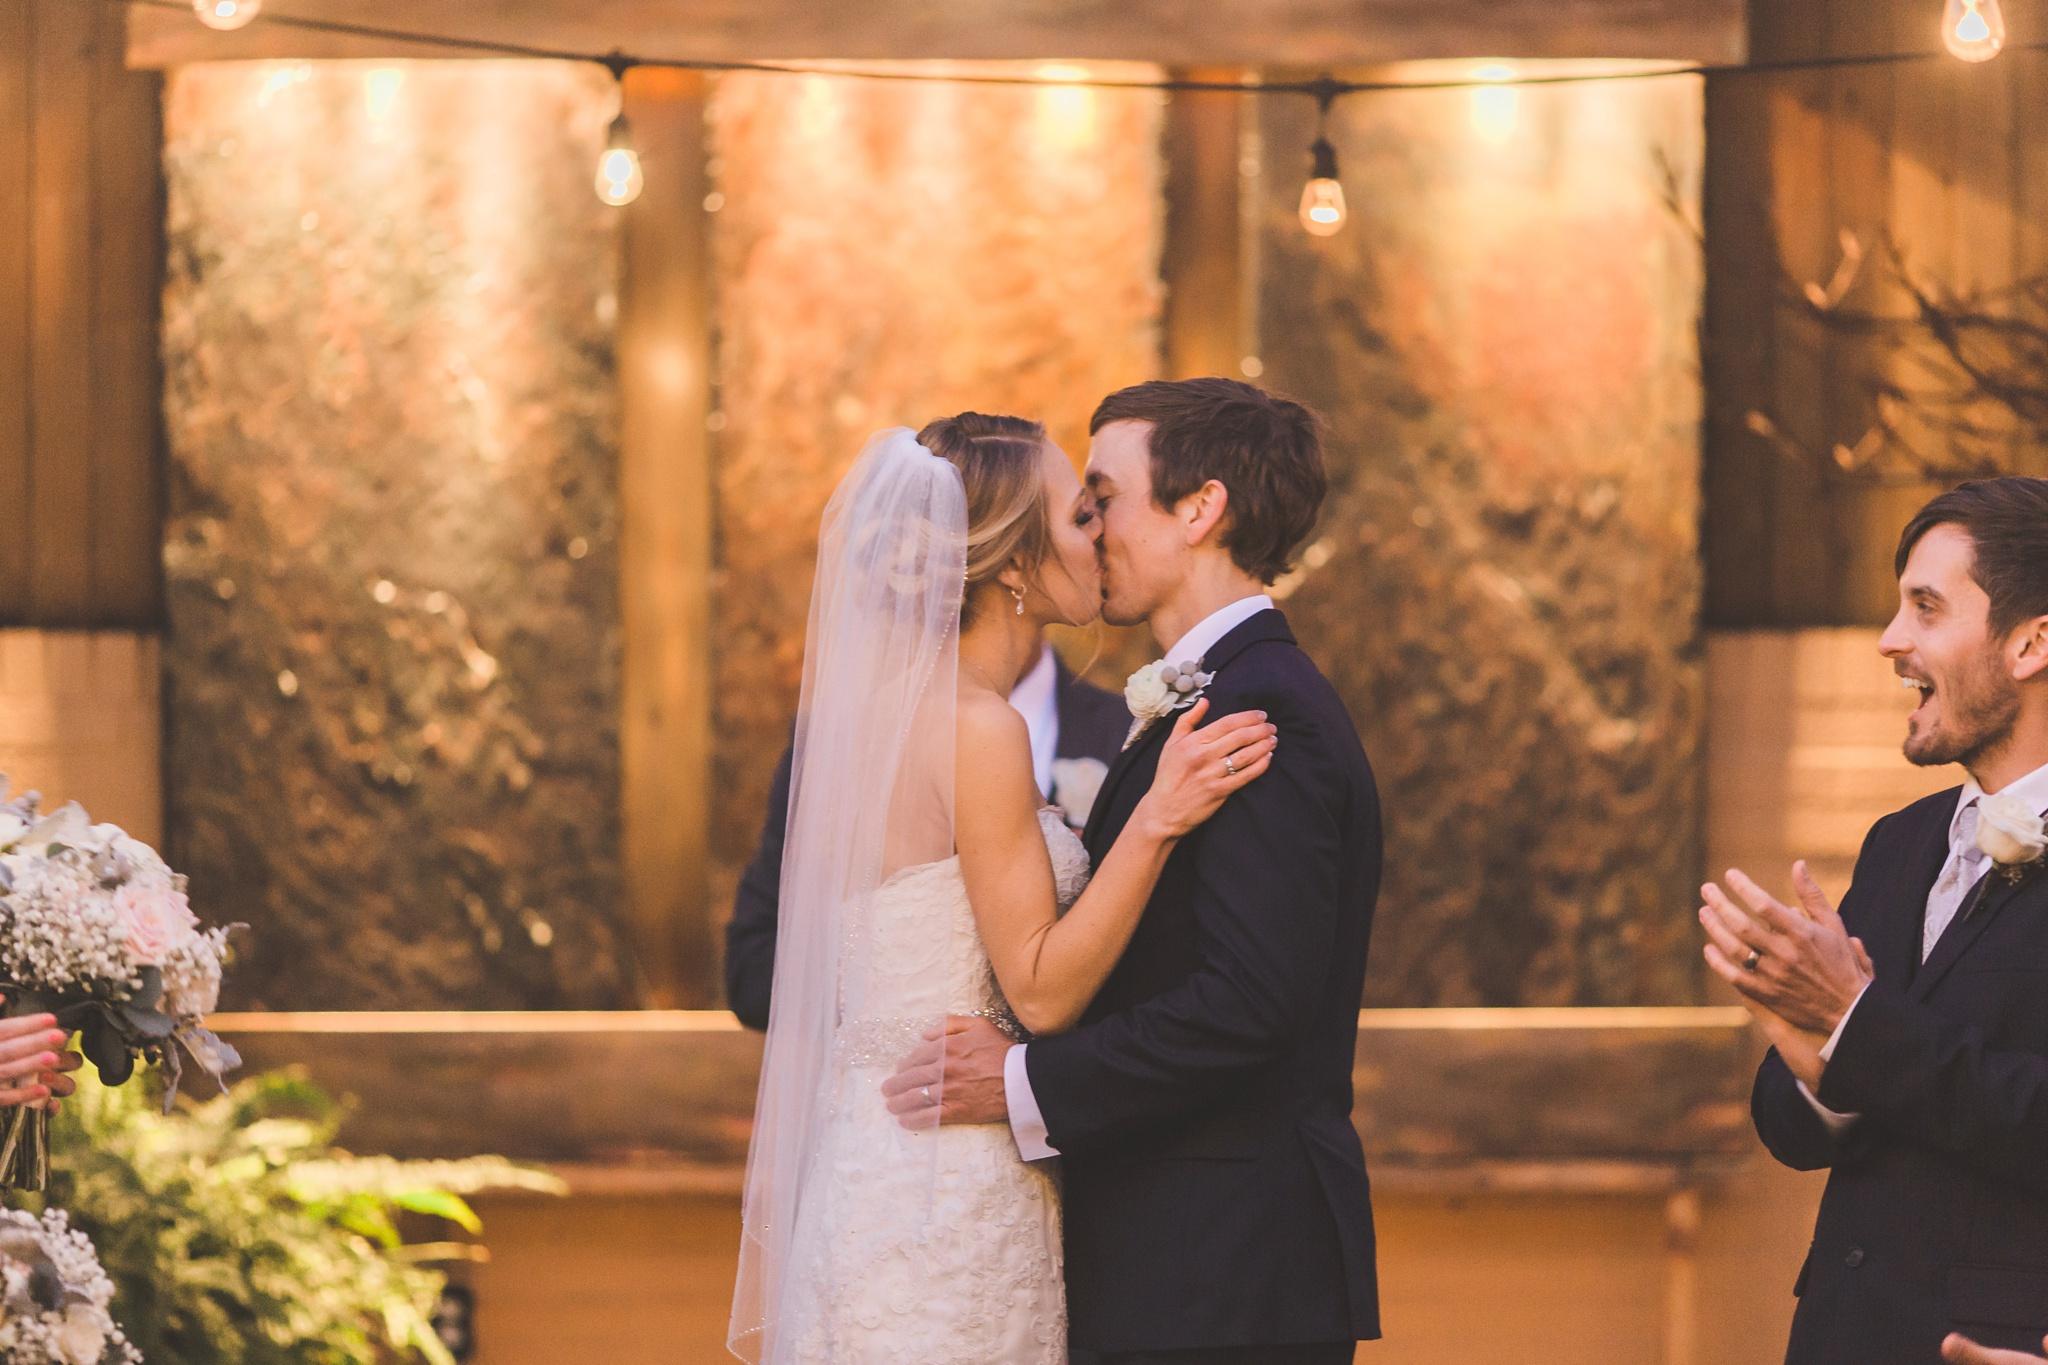 St. Louis Wedding Photographer   Chandler Rose Photography_0054.jpg